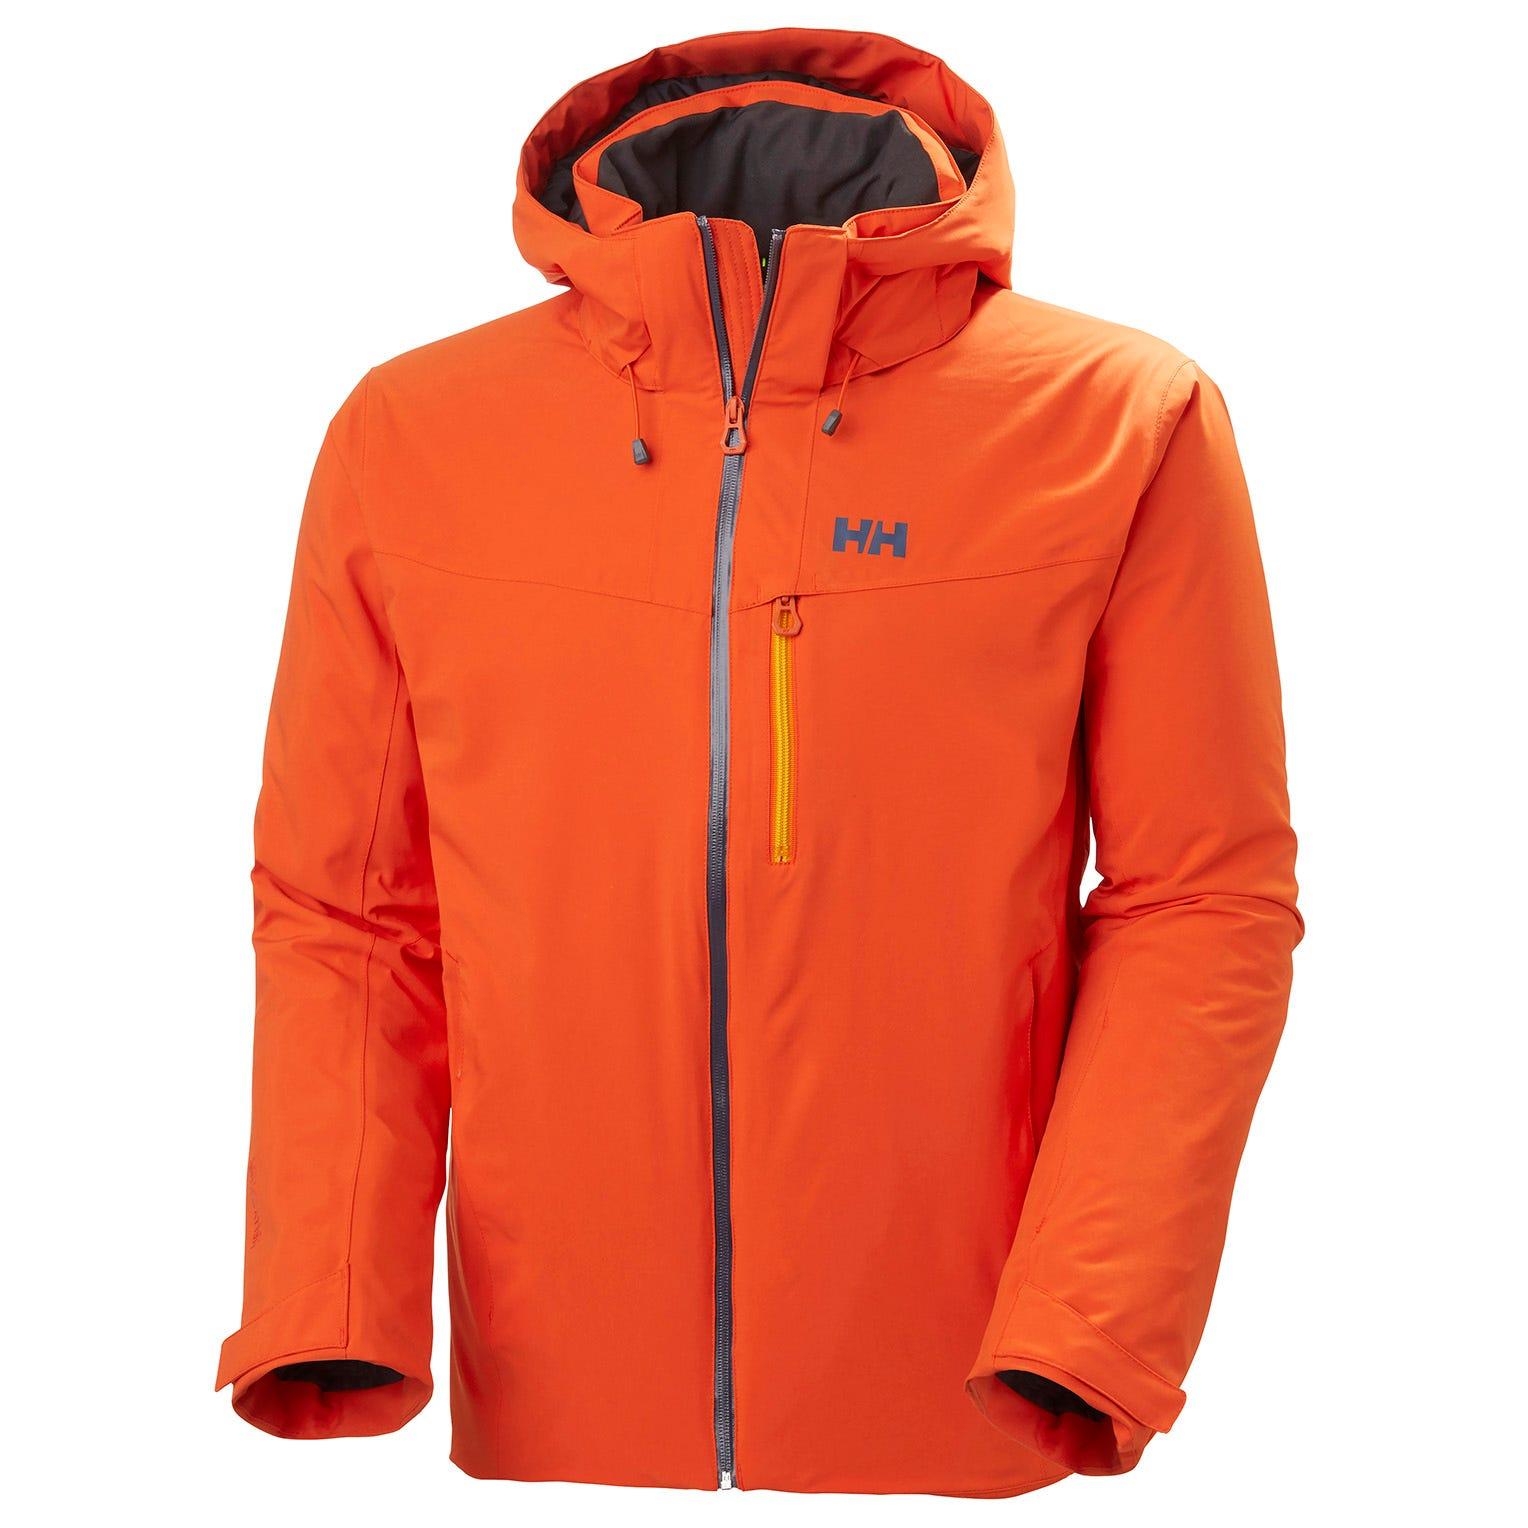 Mens Swift 4.0 Waterproof Resort Ski Jacket | Helly Hansen Mens Orange XXXL